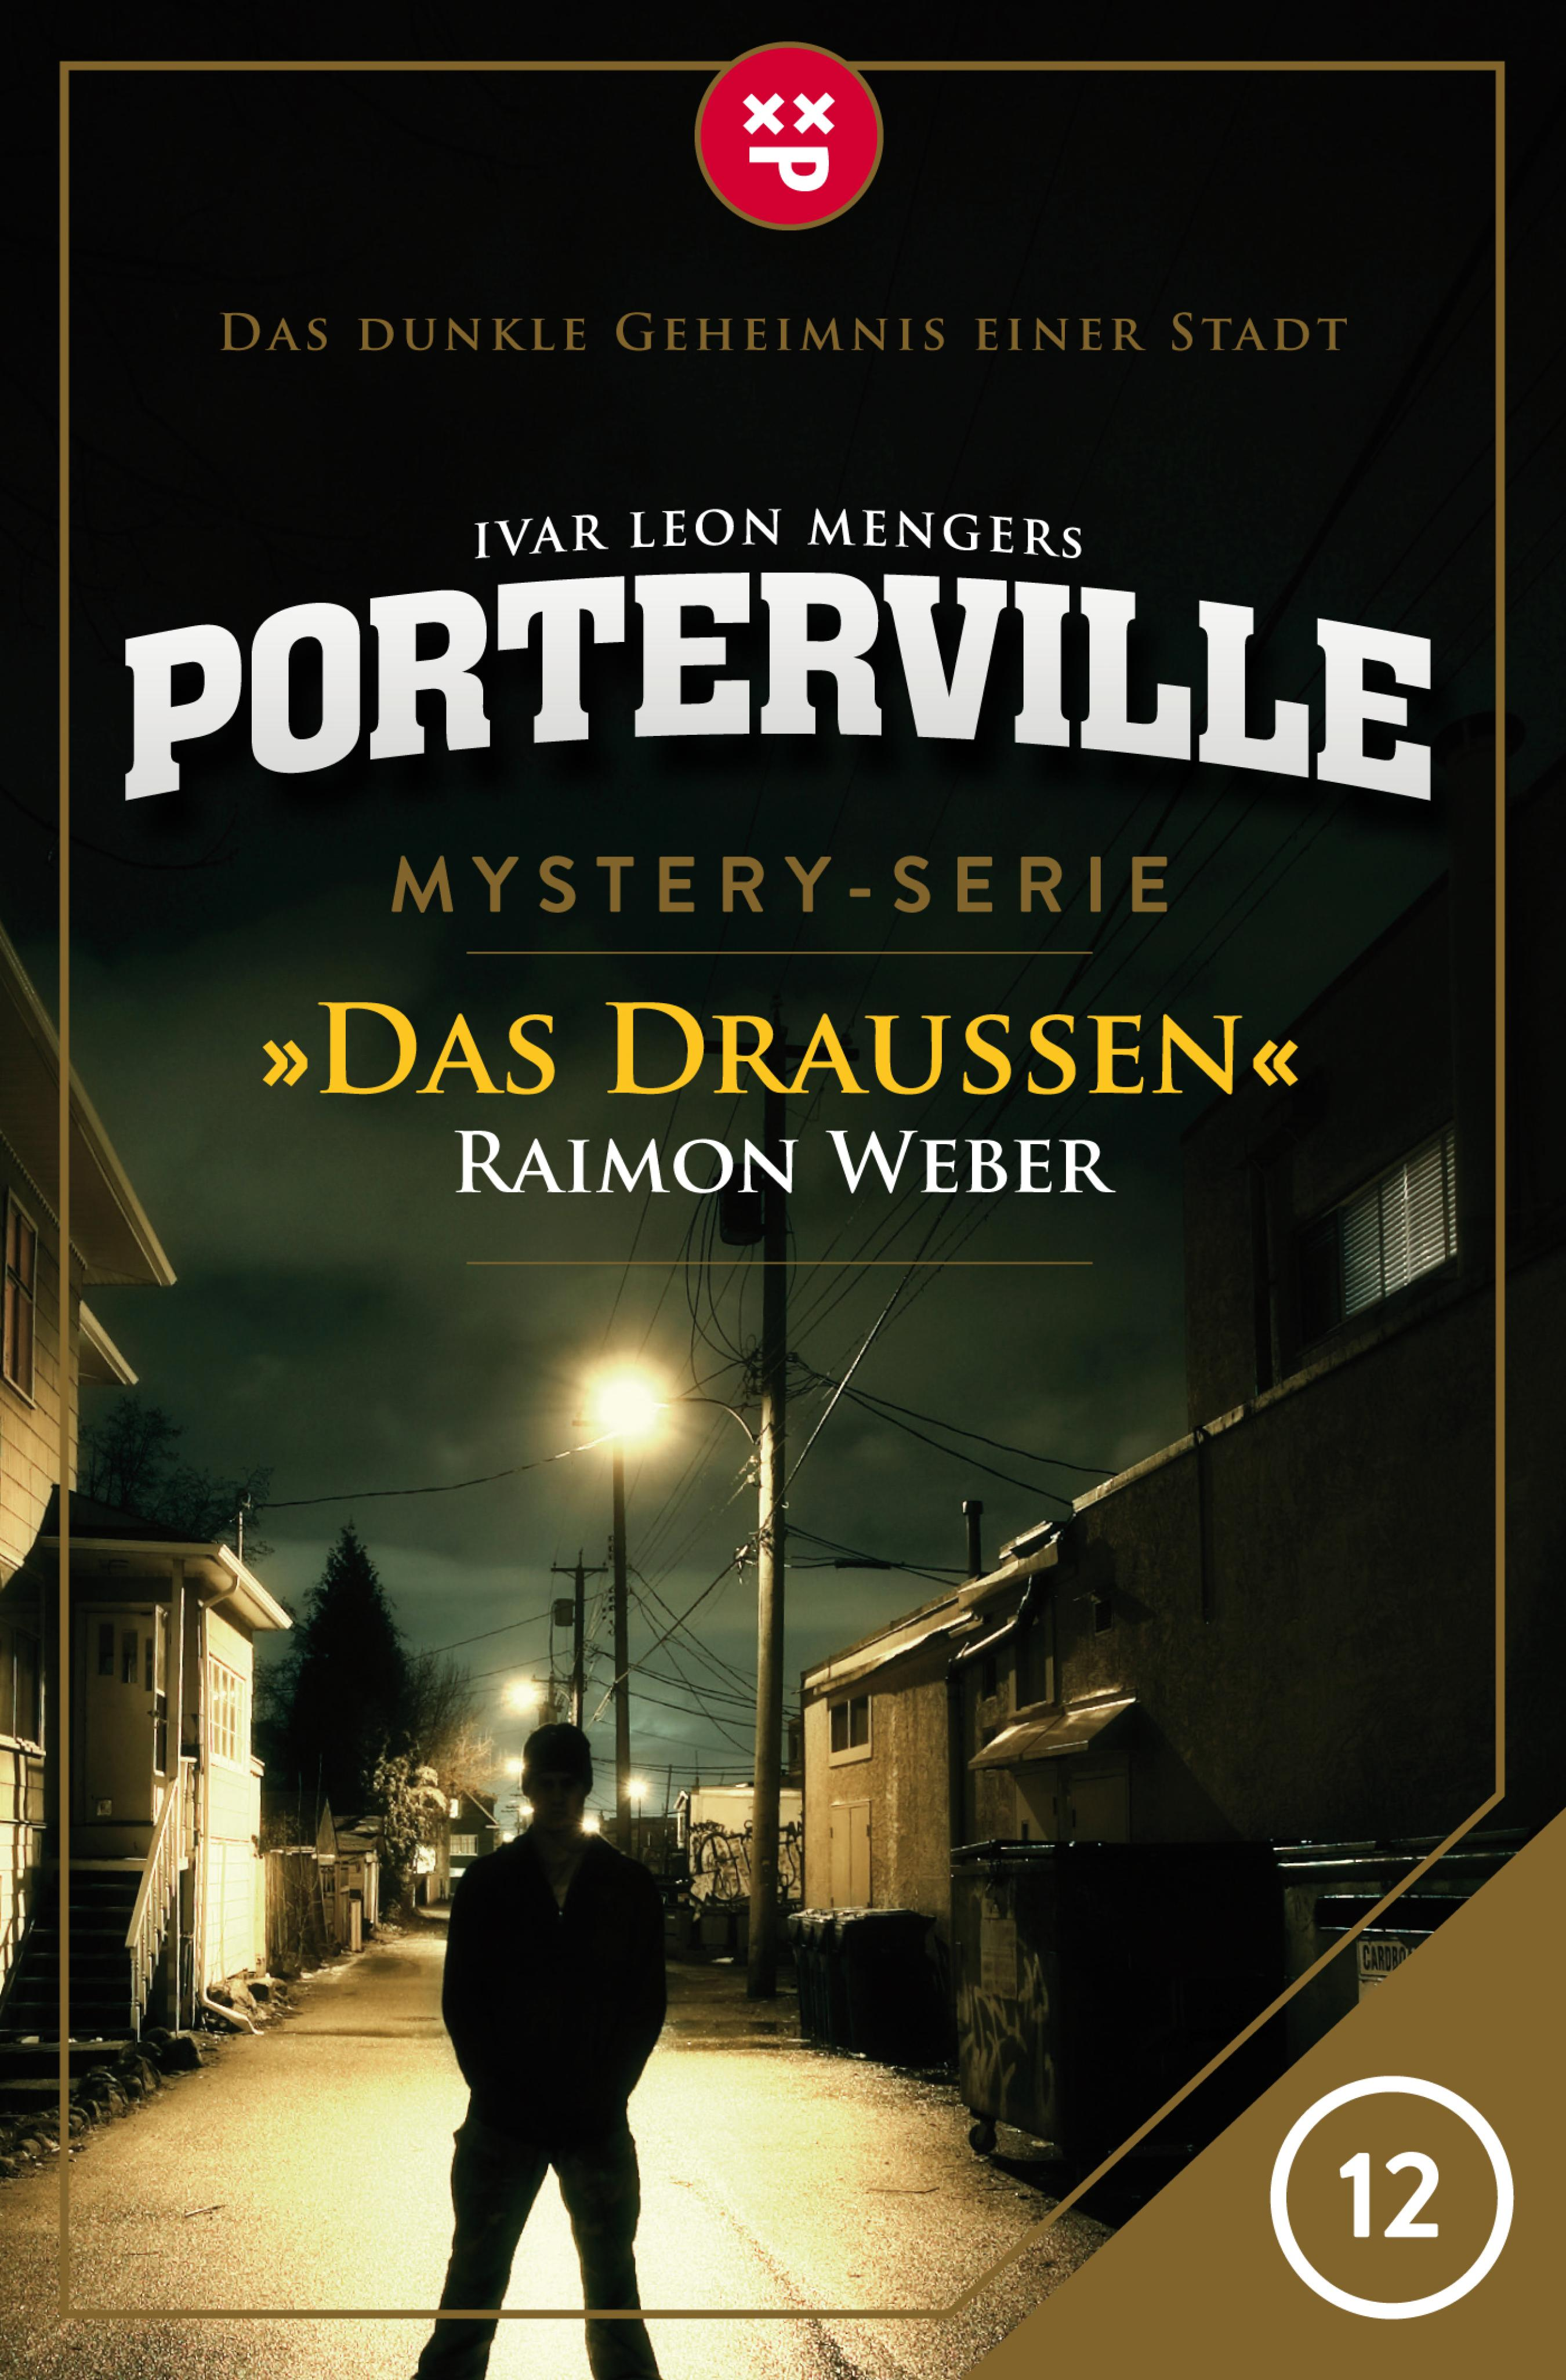 Ivar Leon Menger Porterville - Folge 12: Das Draußen ivar paulson vana eesti rahvausk page 4